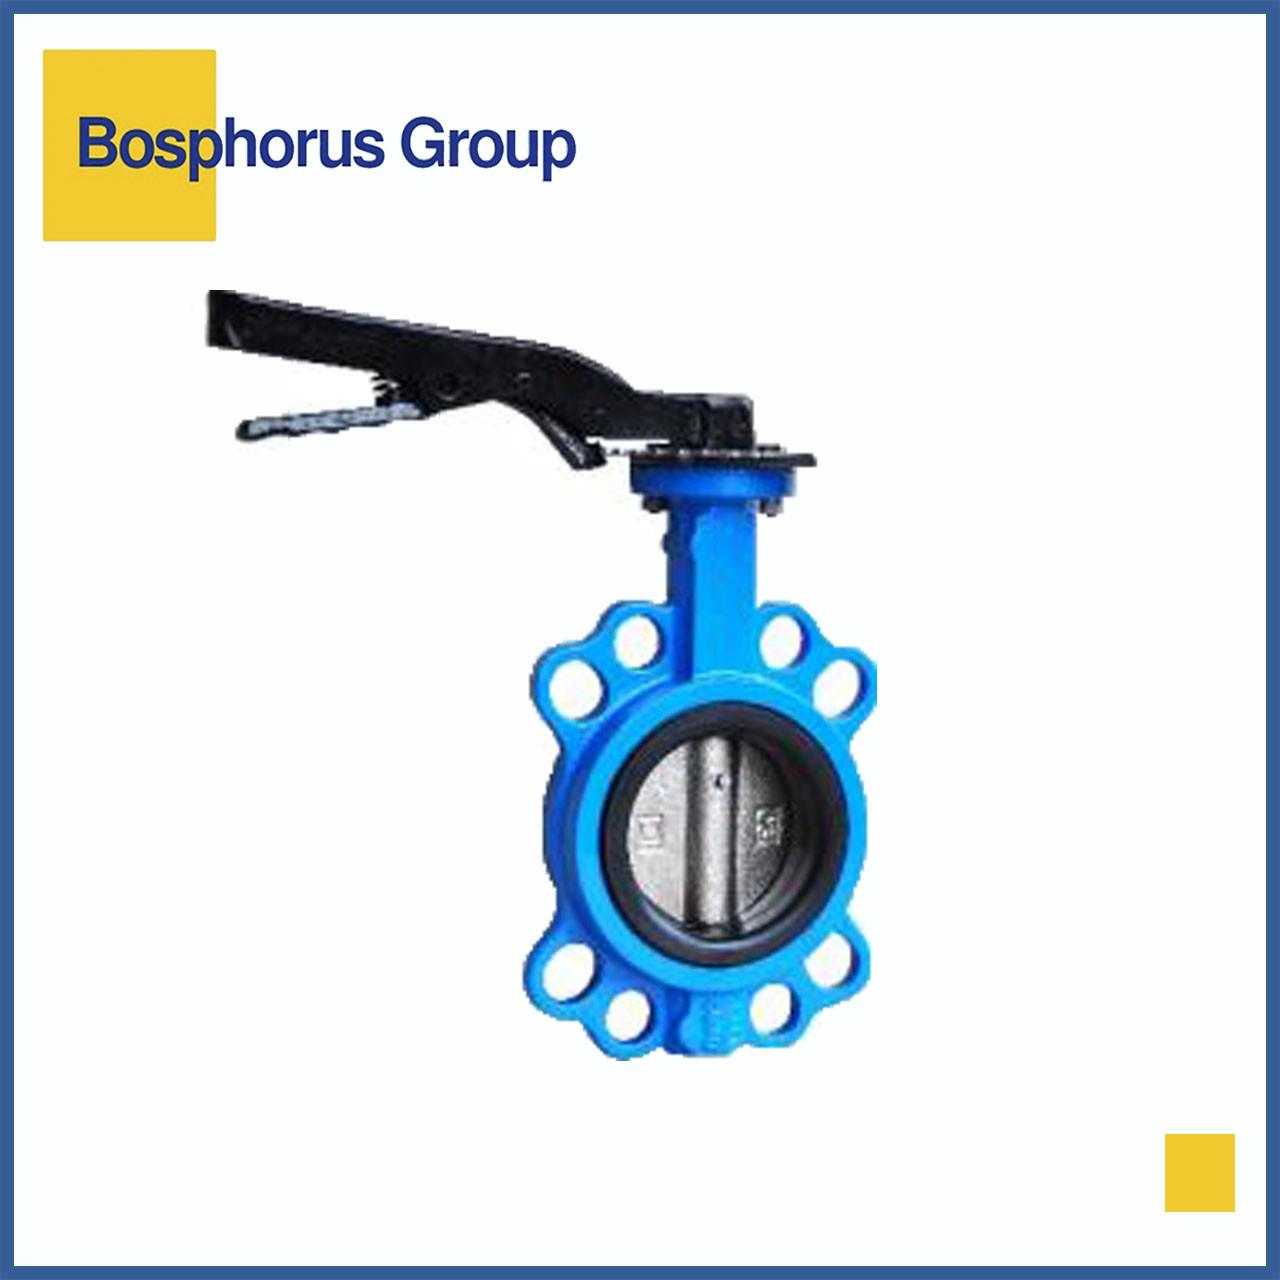 Затвор дисковый межфланцевый Ду50 Ру16, Brandoni (вода, +120)